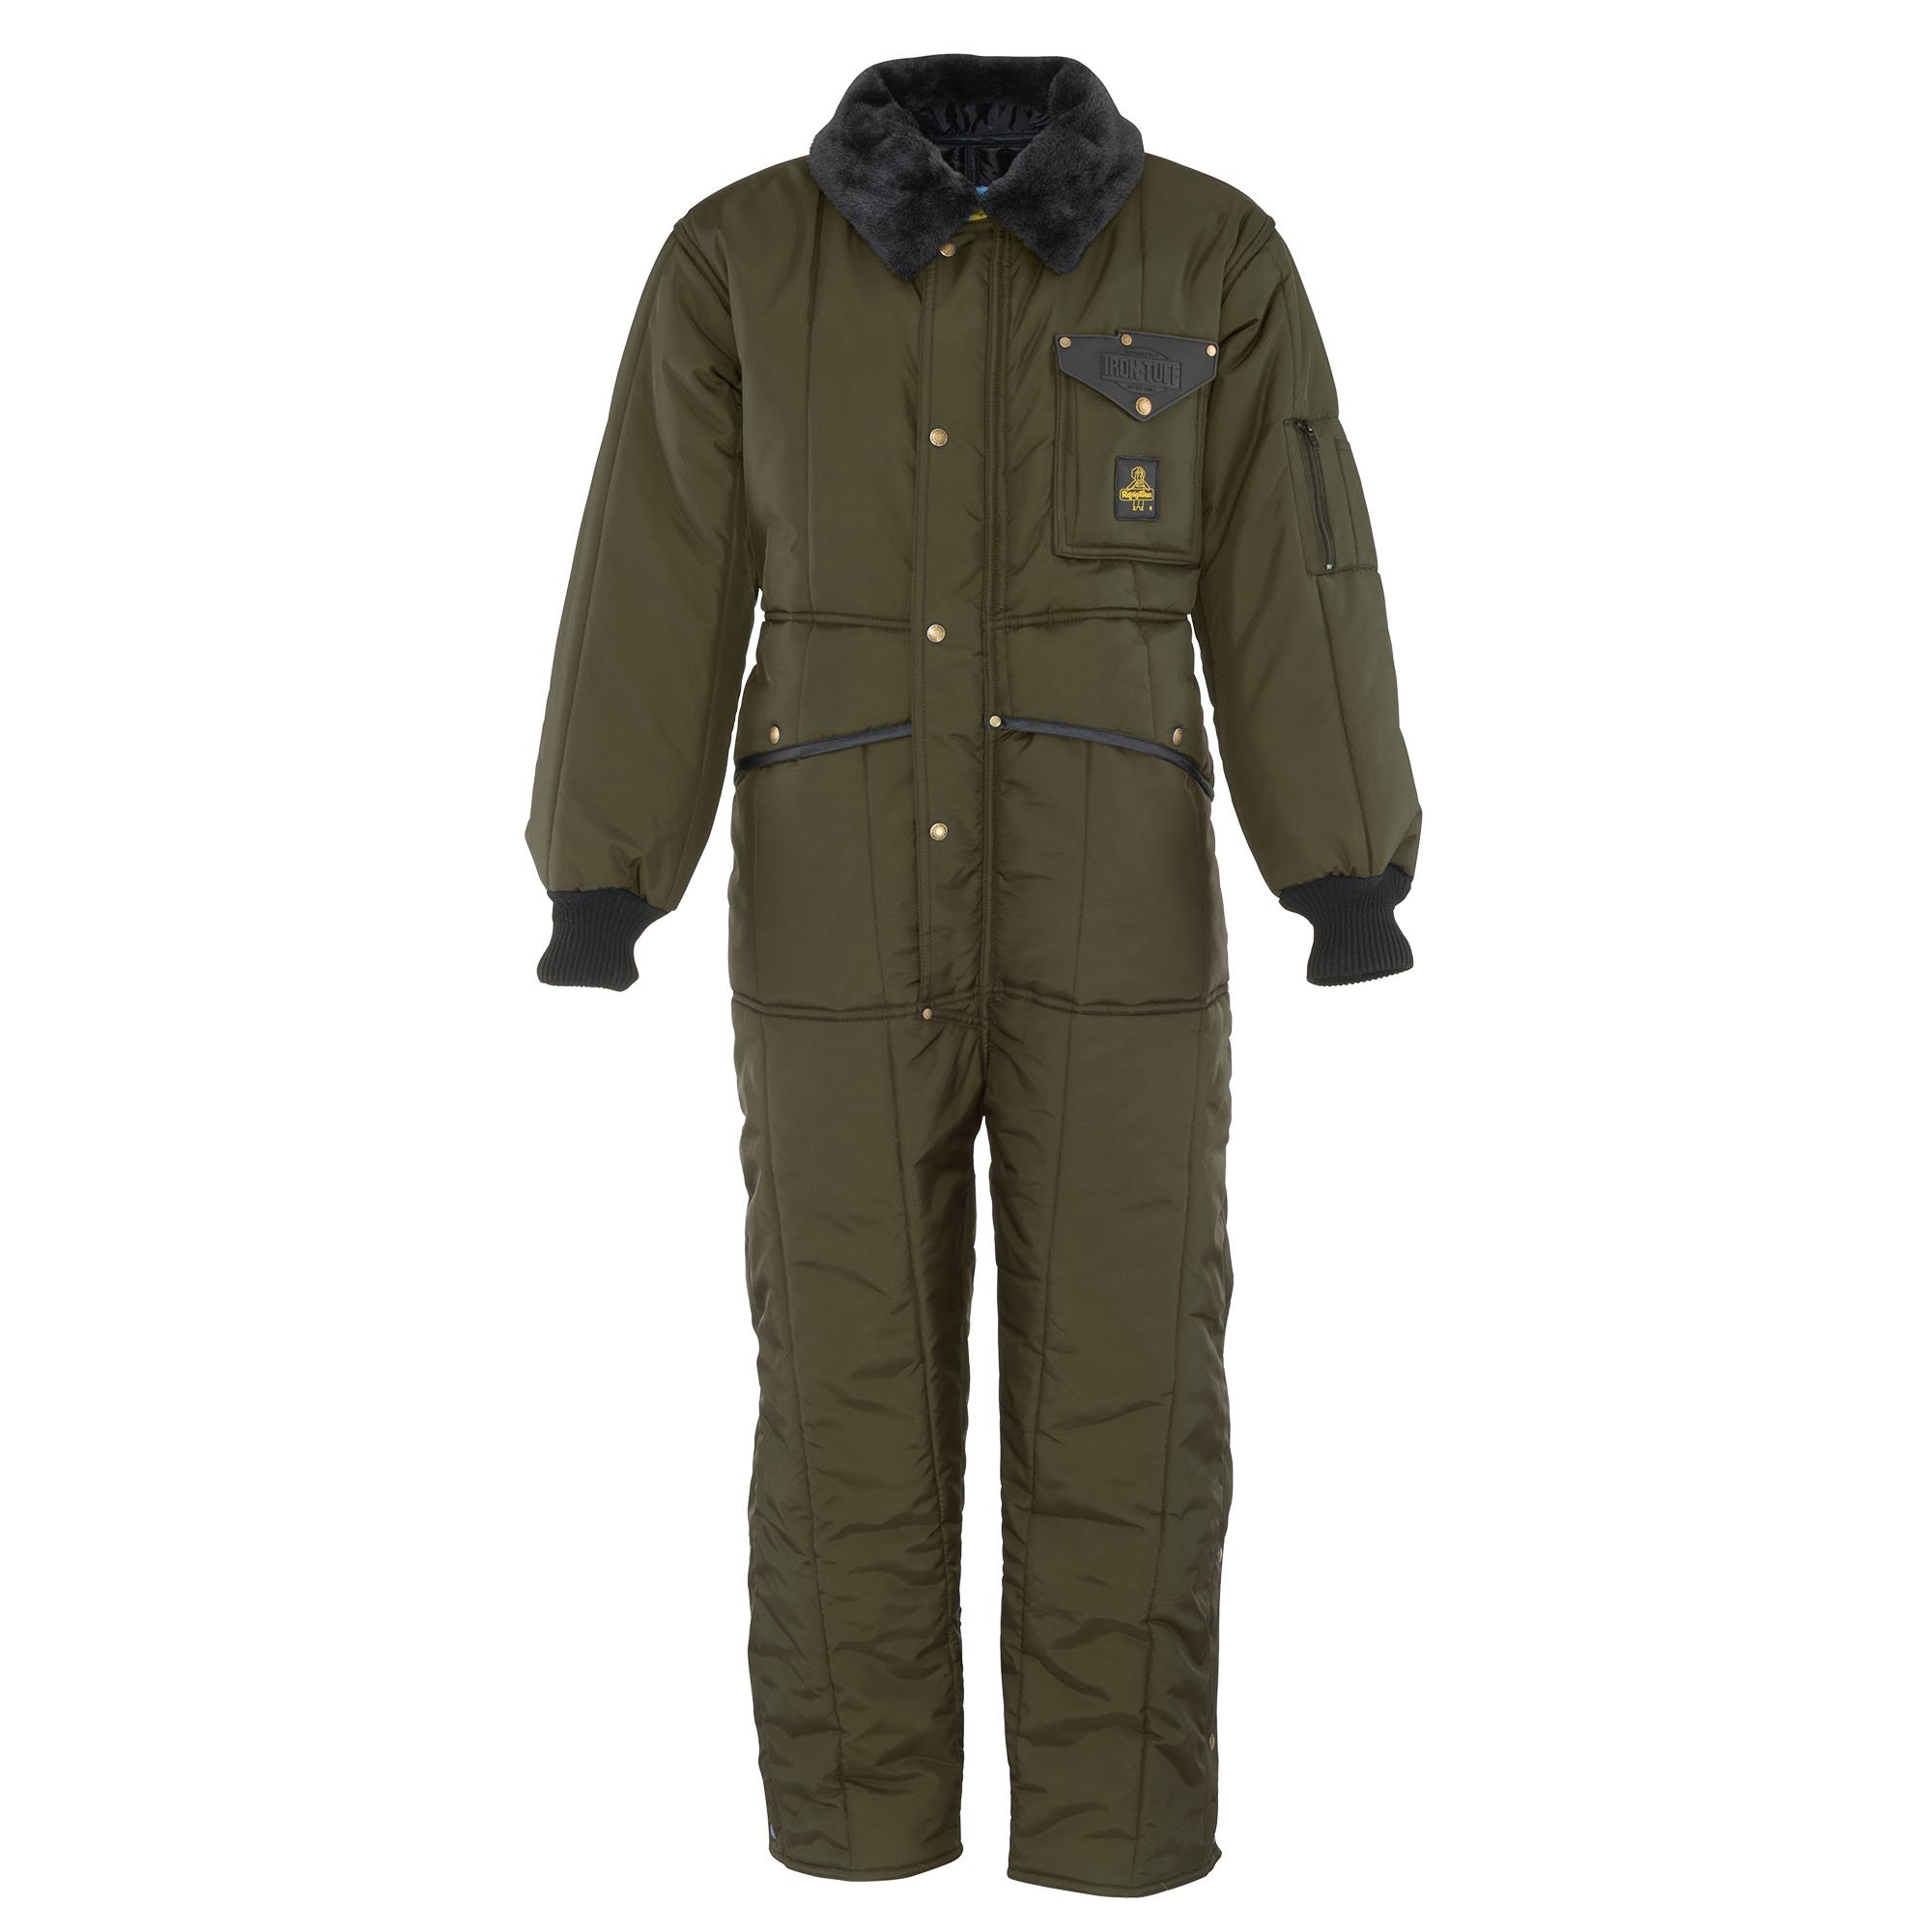 RefrigiWear Men's Iron-Tuff Coveralls Minus 50 Suit (Sage, Small Short)